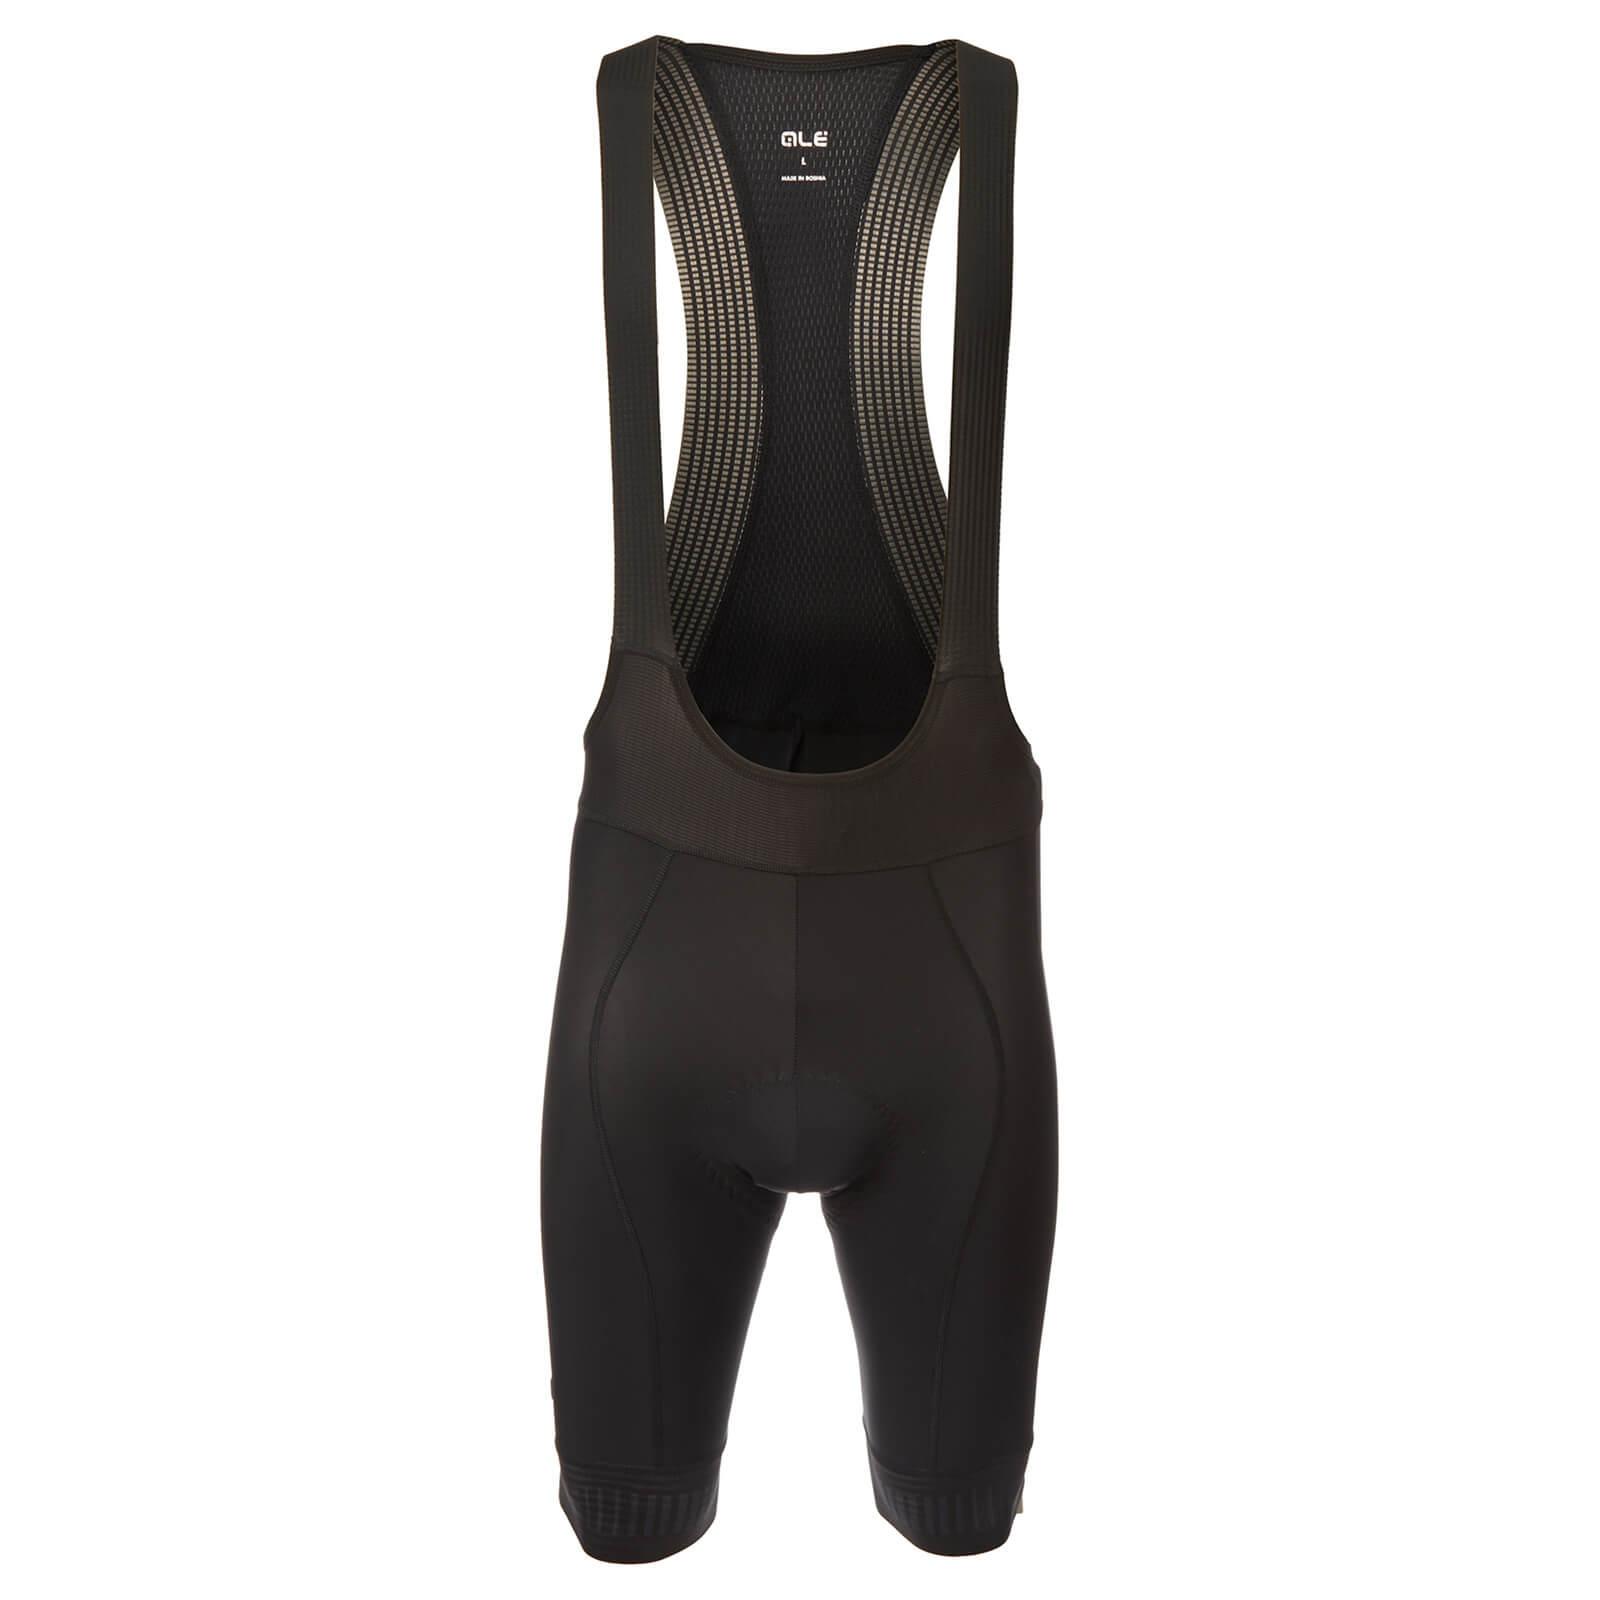 Alé PRR Strada Bib Shorts - M - Black/Charcoal